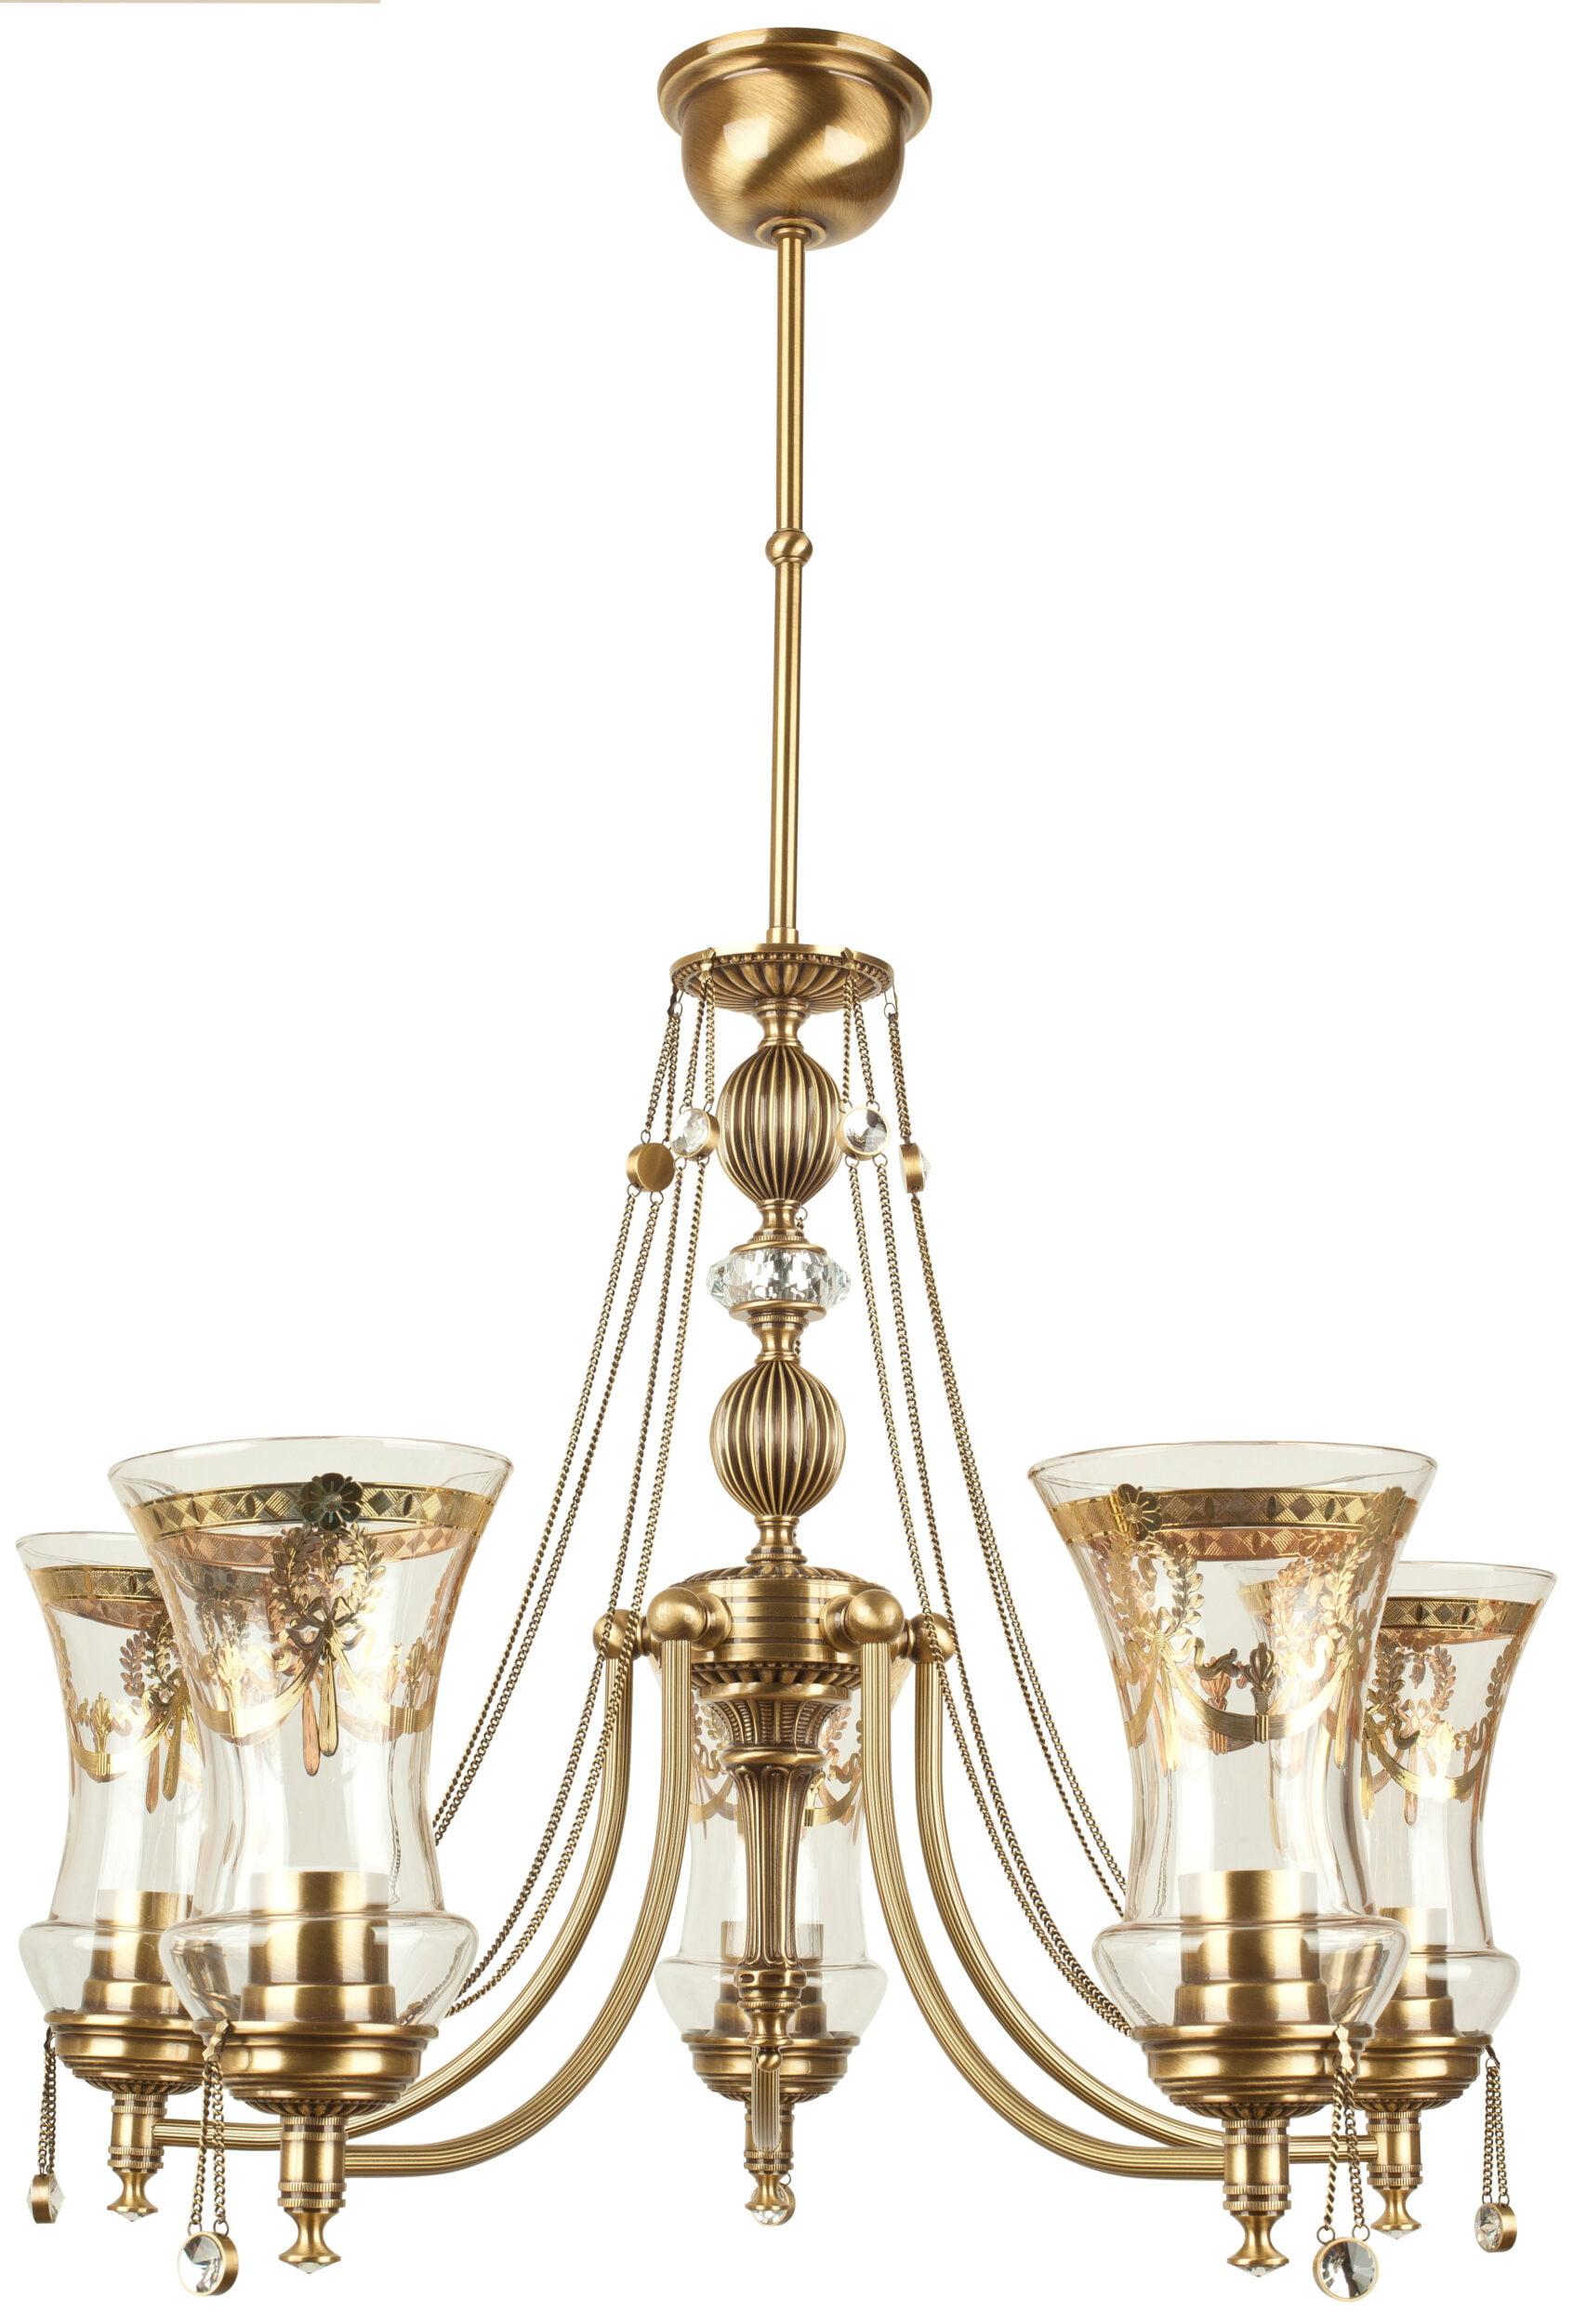 Antique Brass Chandelier With Crystals Nico Luxury Chandelier